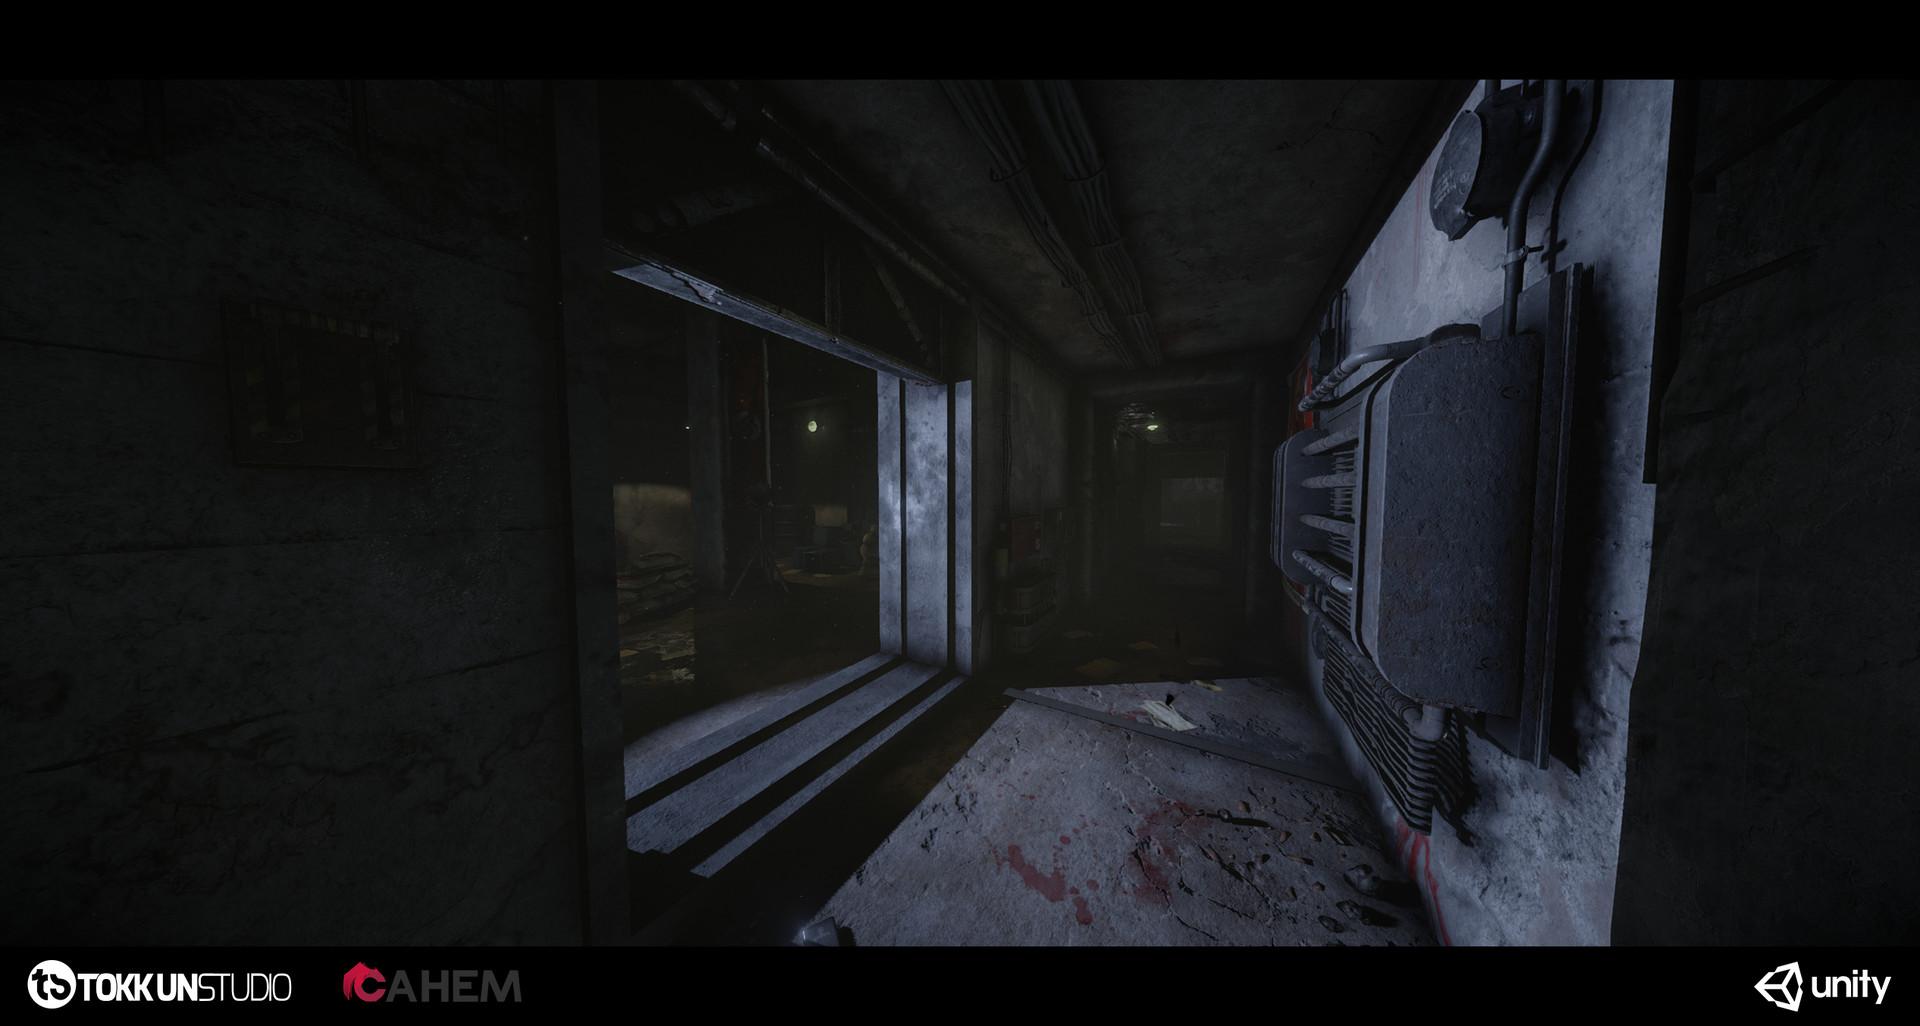 Tokkun studio bunker shot 03